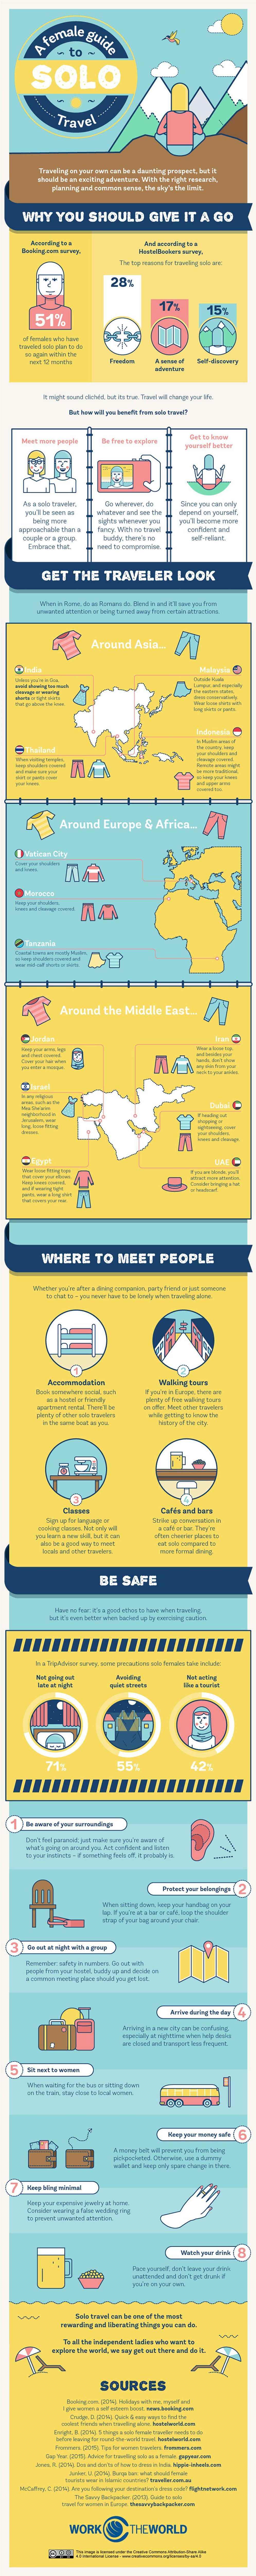 Women Traveling Alone Guide